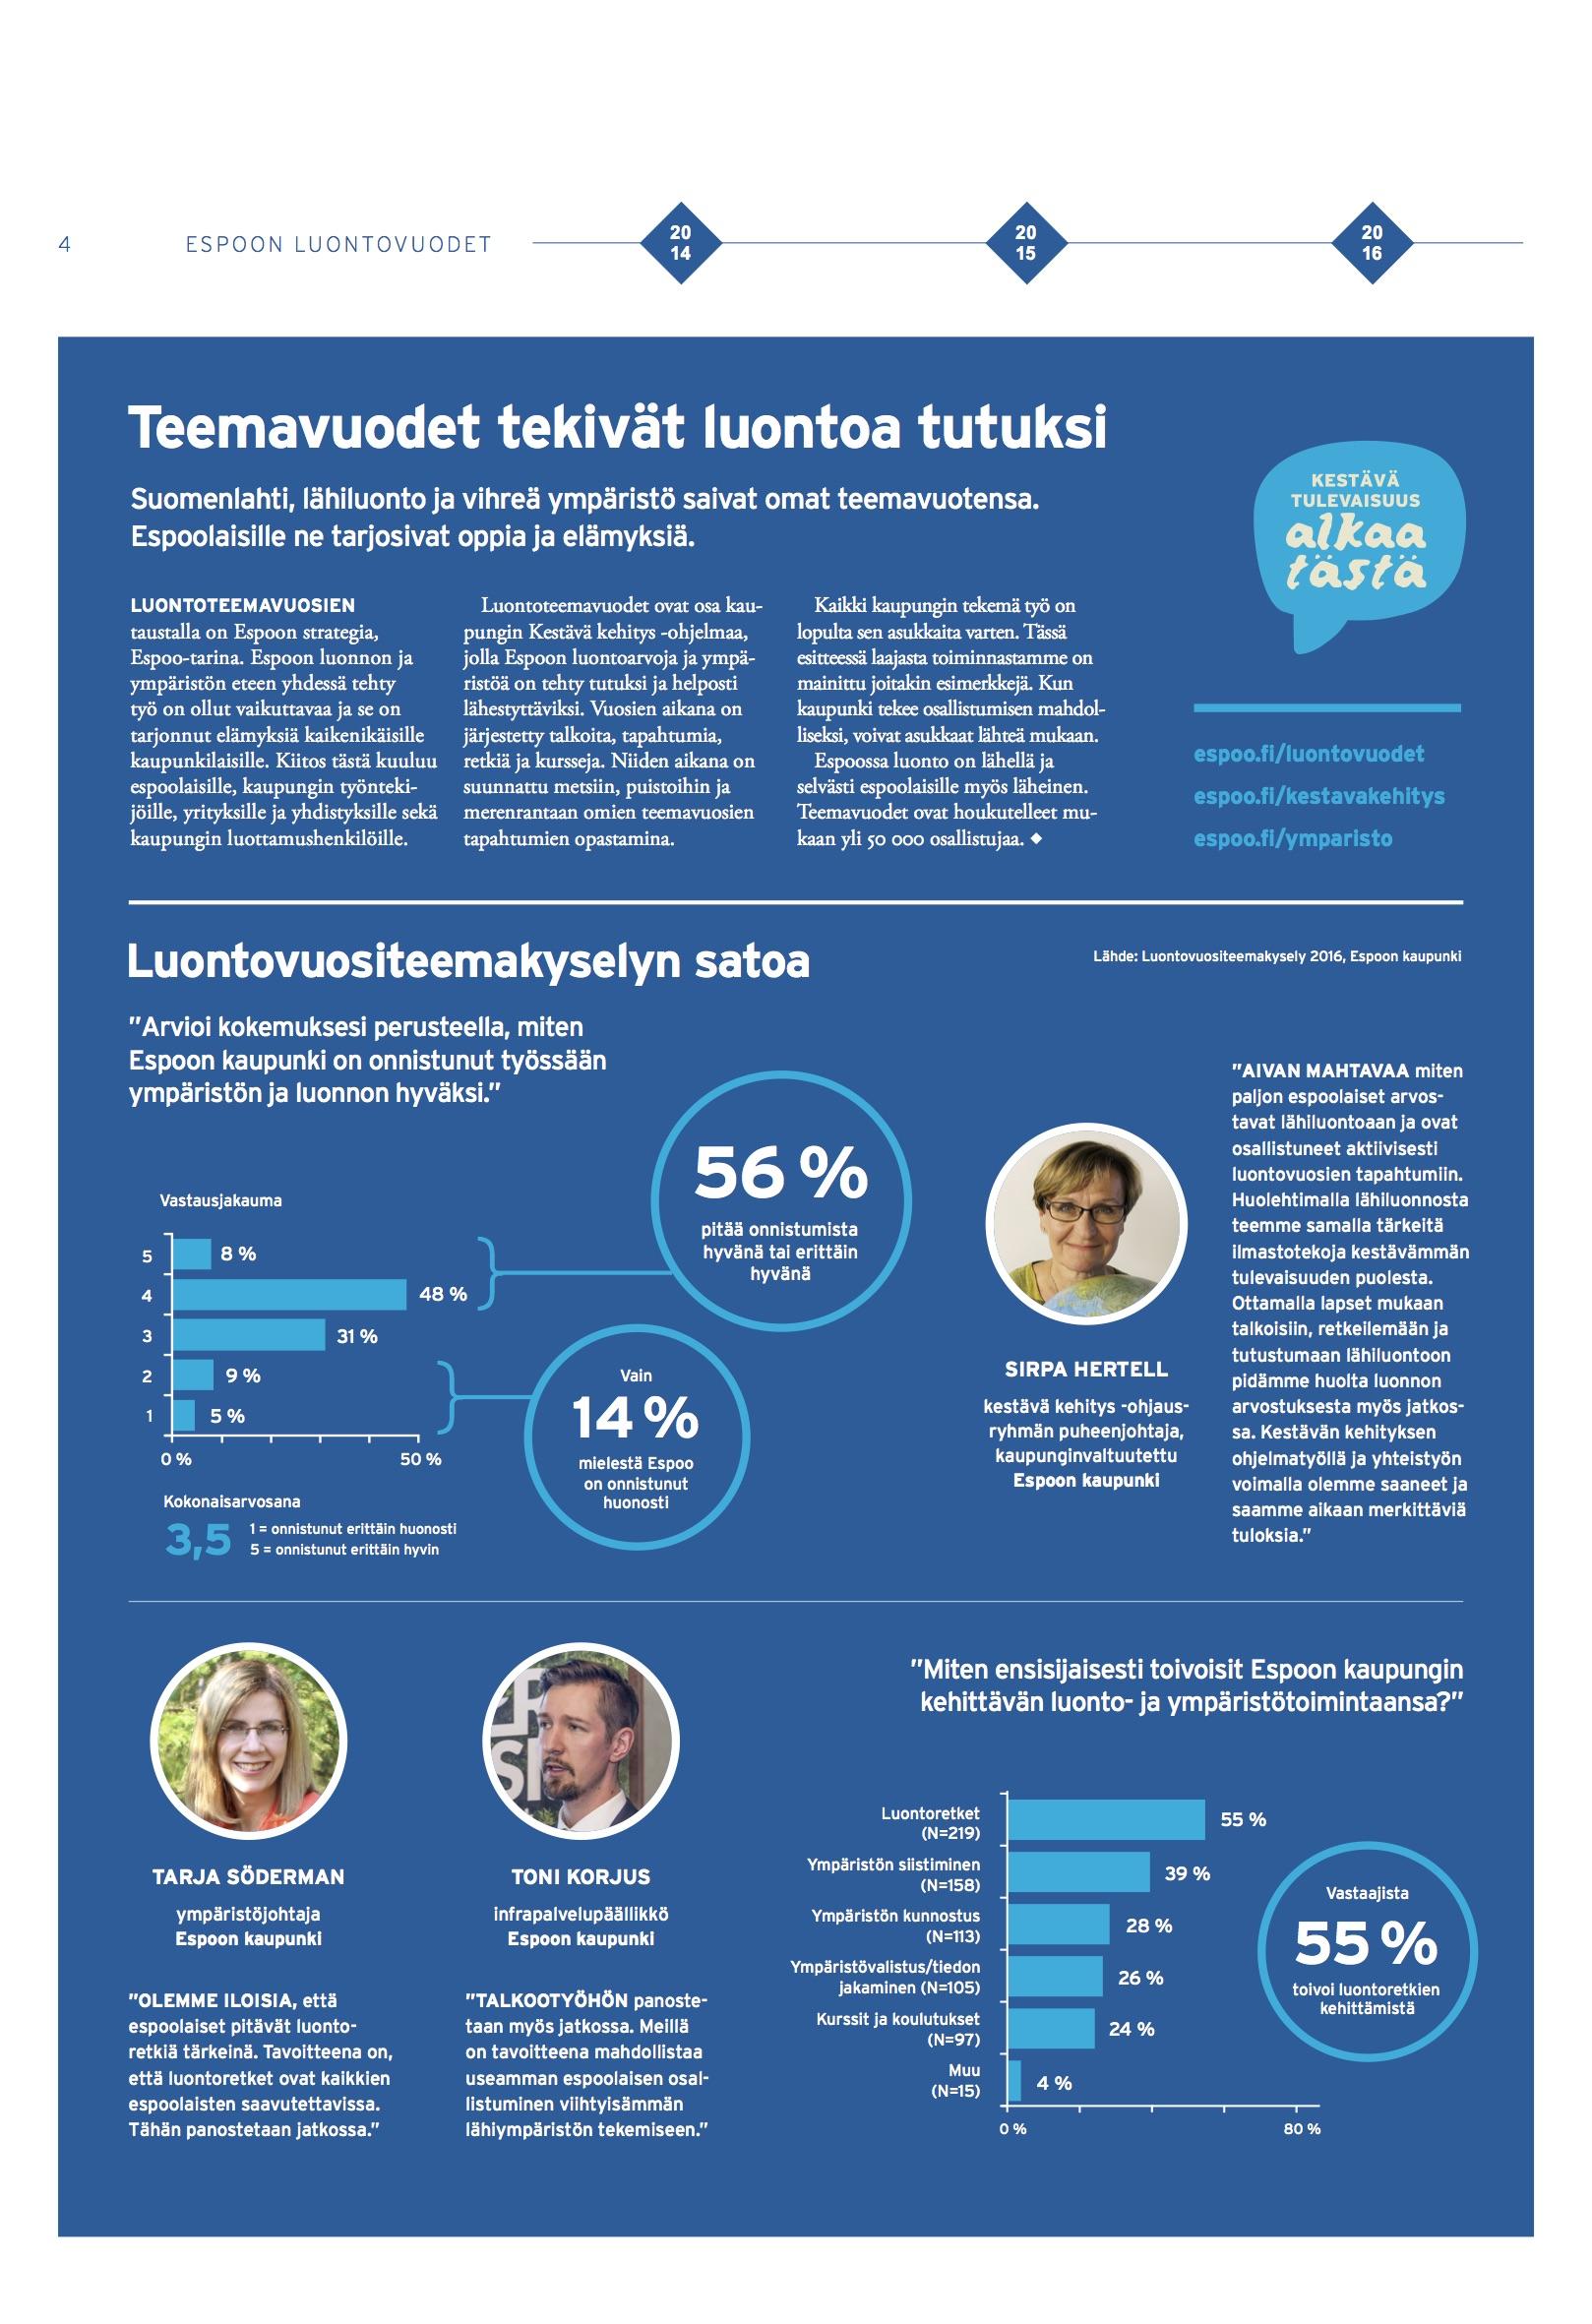 telkku mtv3 max Tampere